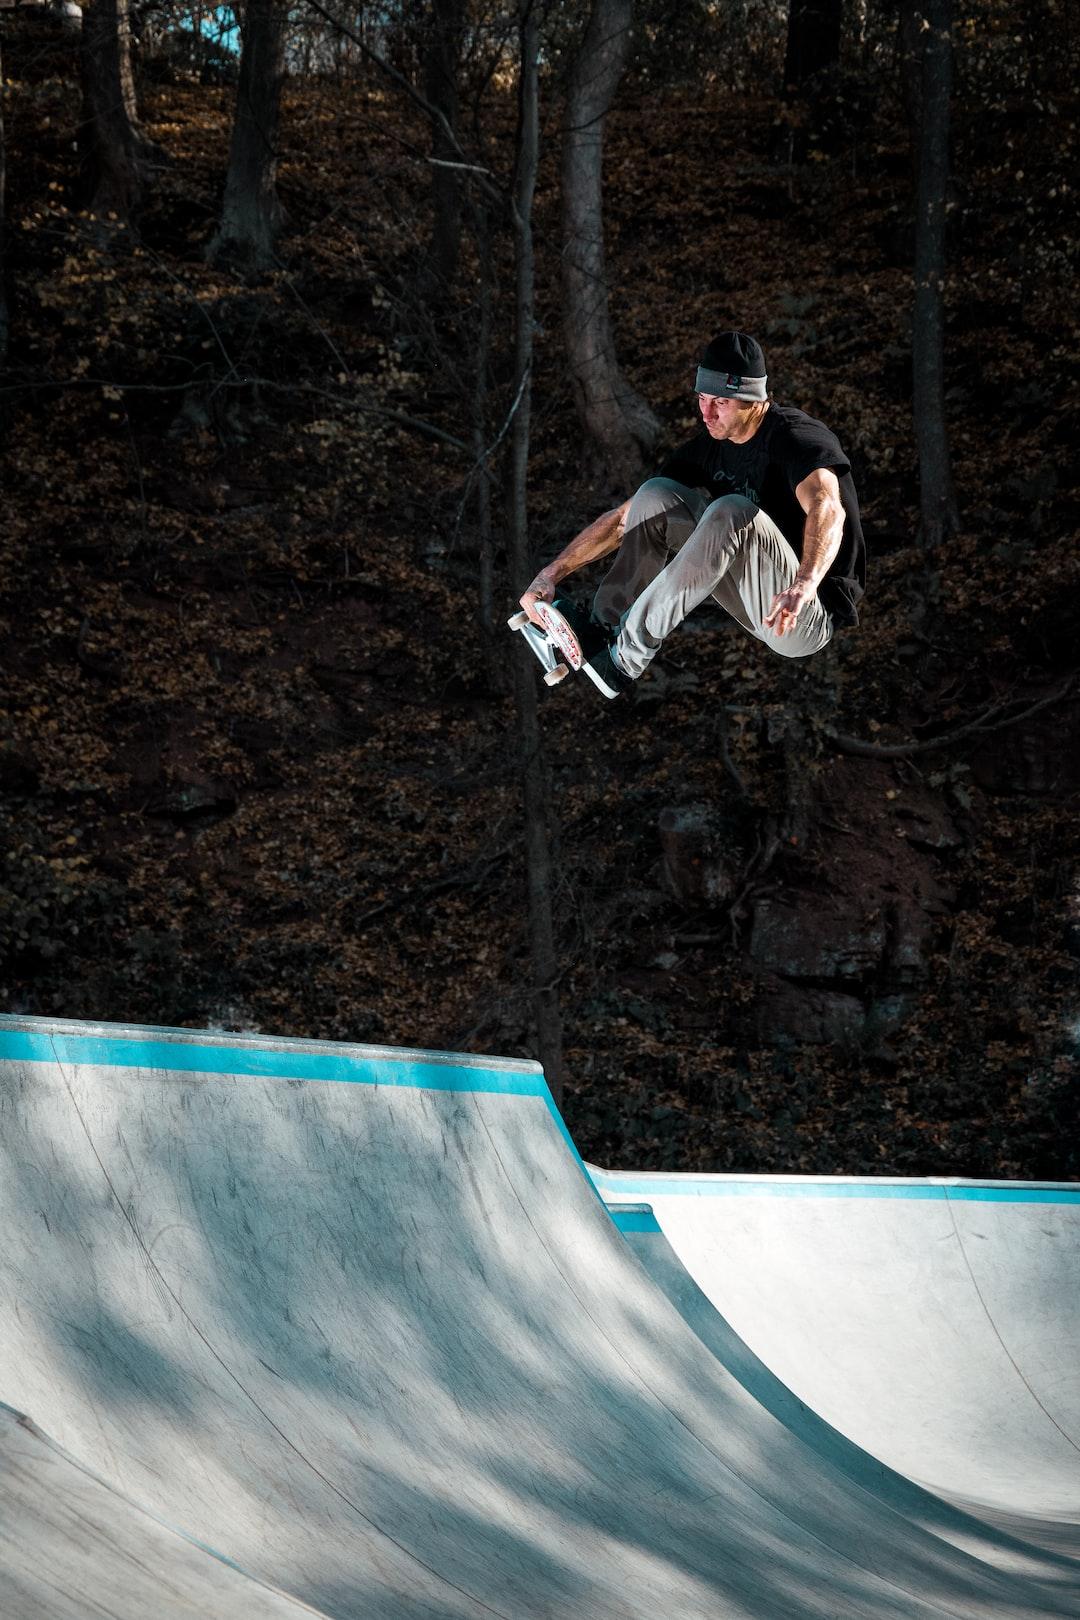 Skateboarder Jan Tomšovský doing fs indy grab transfer over the hip in bowl ;-)